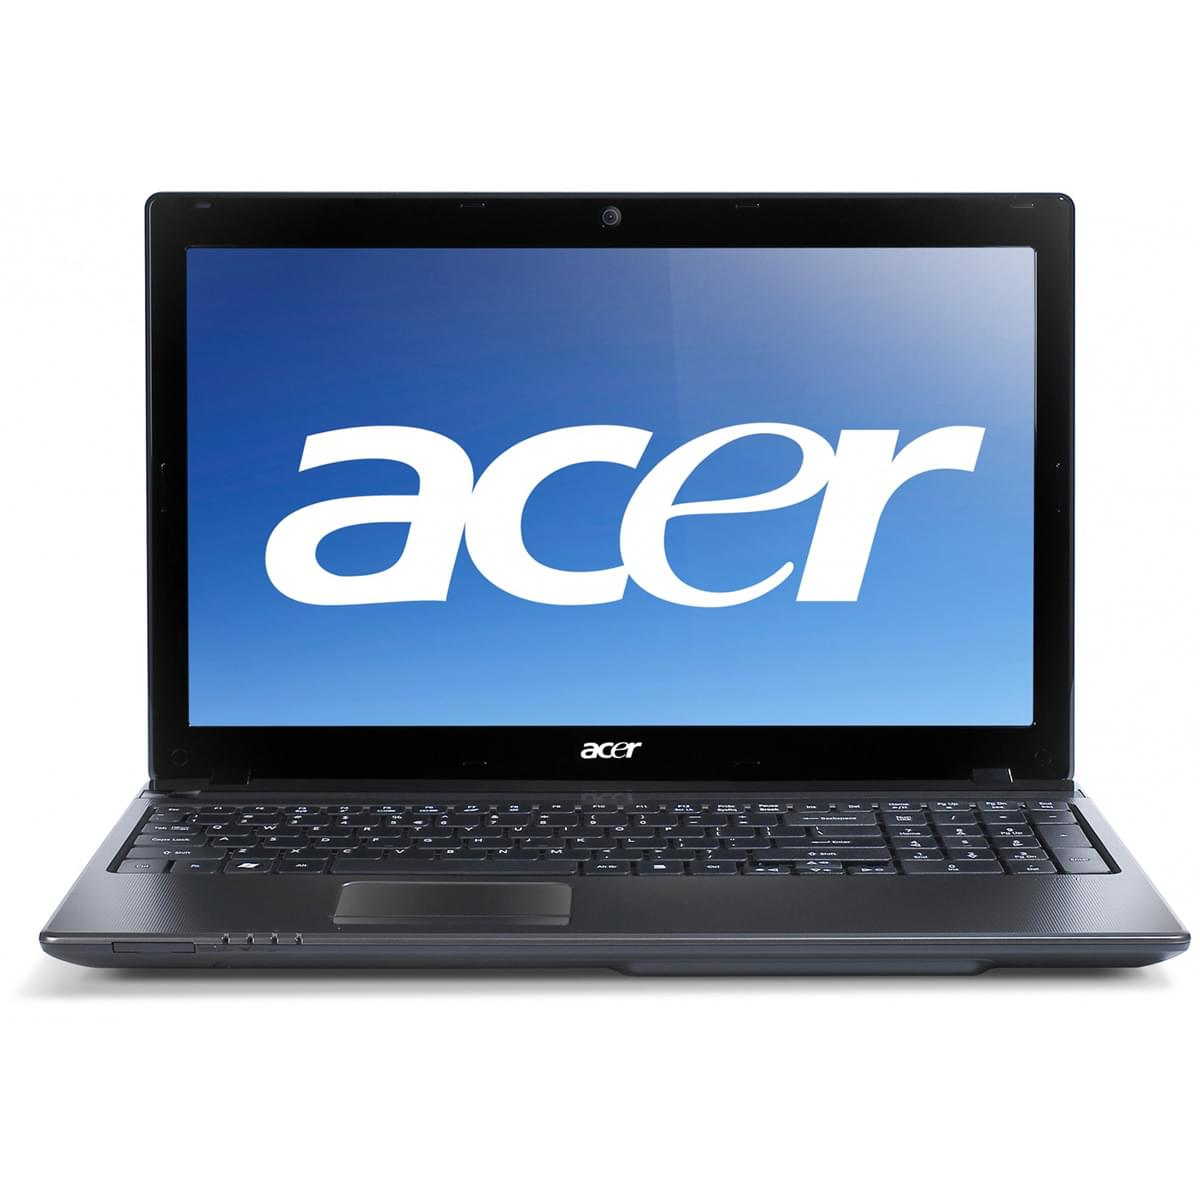 Acer 5755G-2434G1TMn (LX.RPW02.071) - Achat / Vente PC Portable sur Cybertek.fr - 0